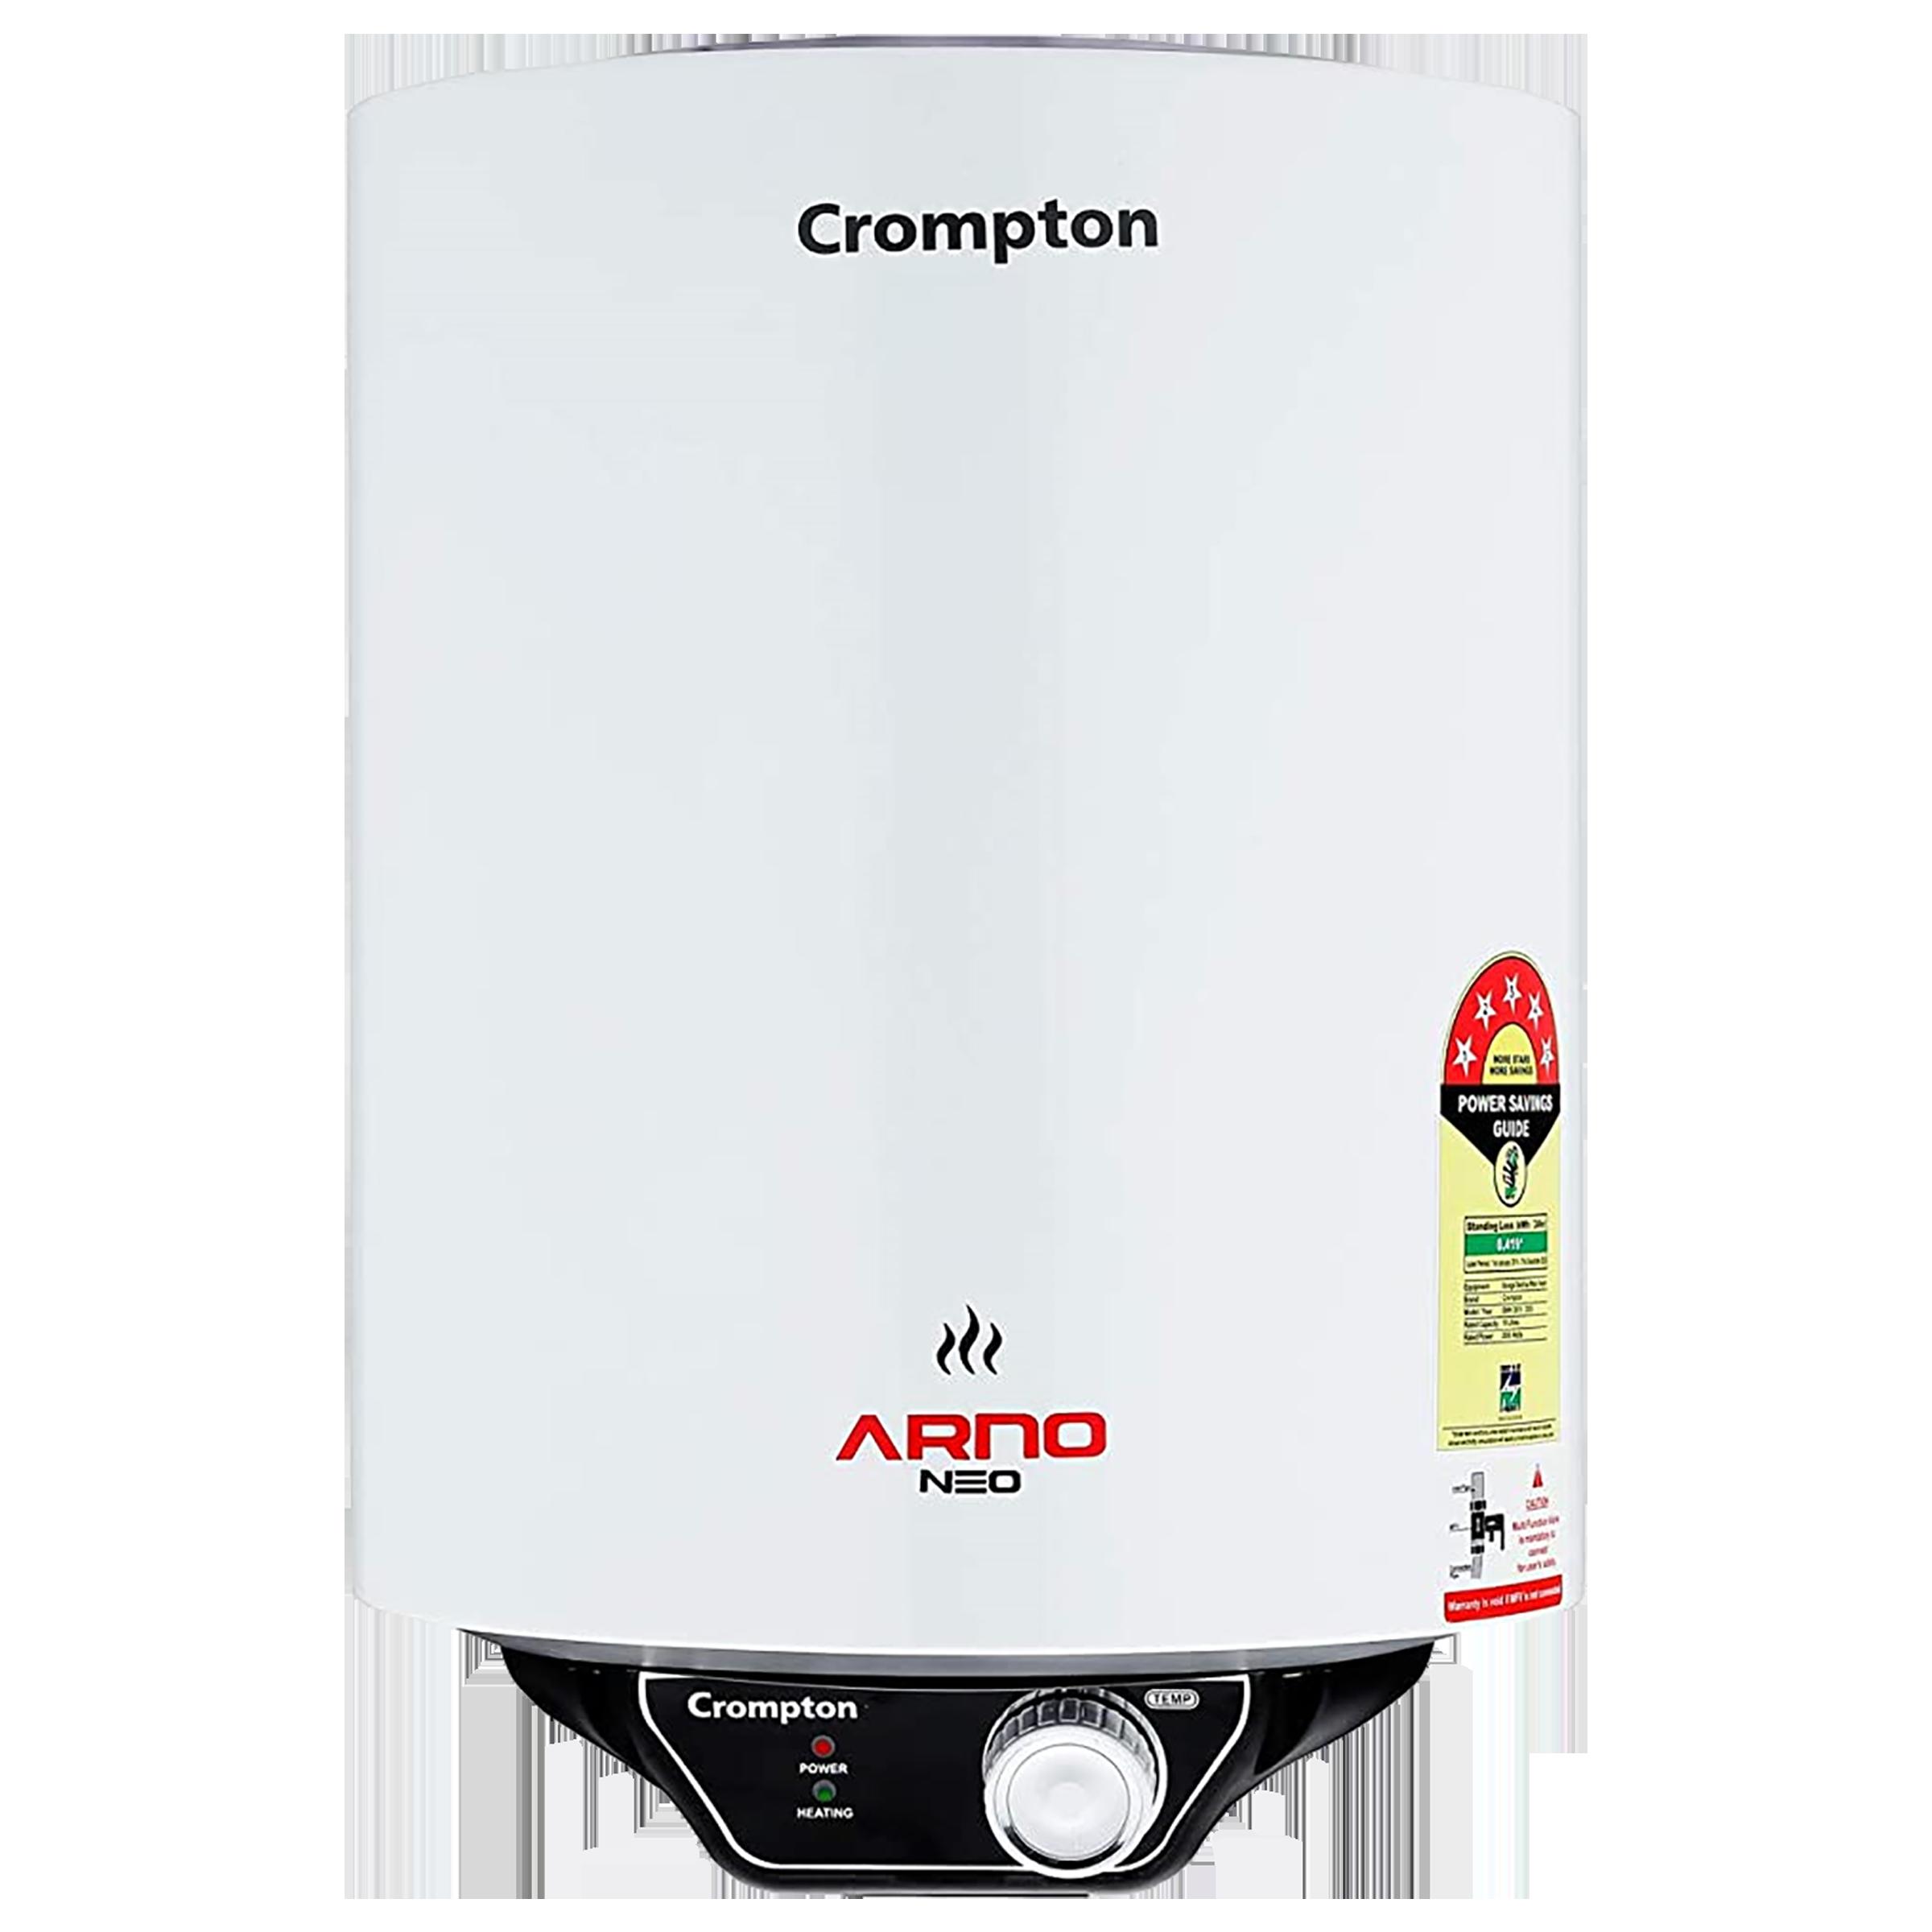 Crompton Arno Neo 25 Litres 5 Star Storage Water Geyser (2000 Watts, ASWH-3025, White)_1